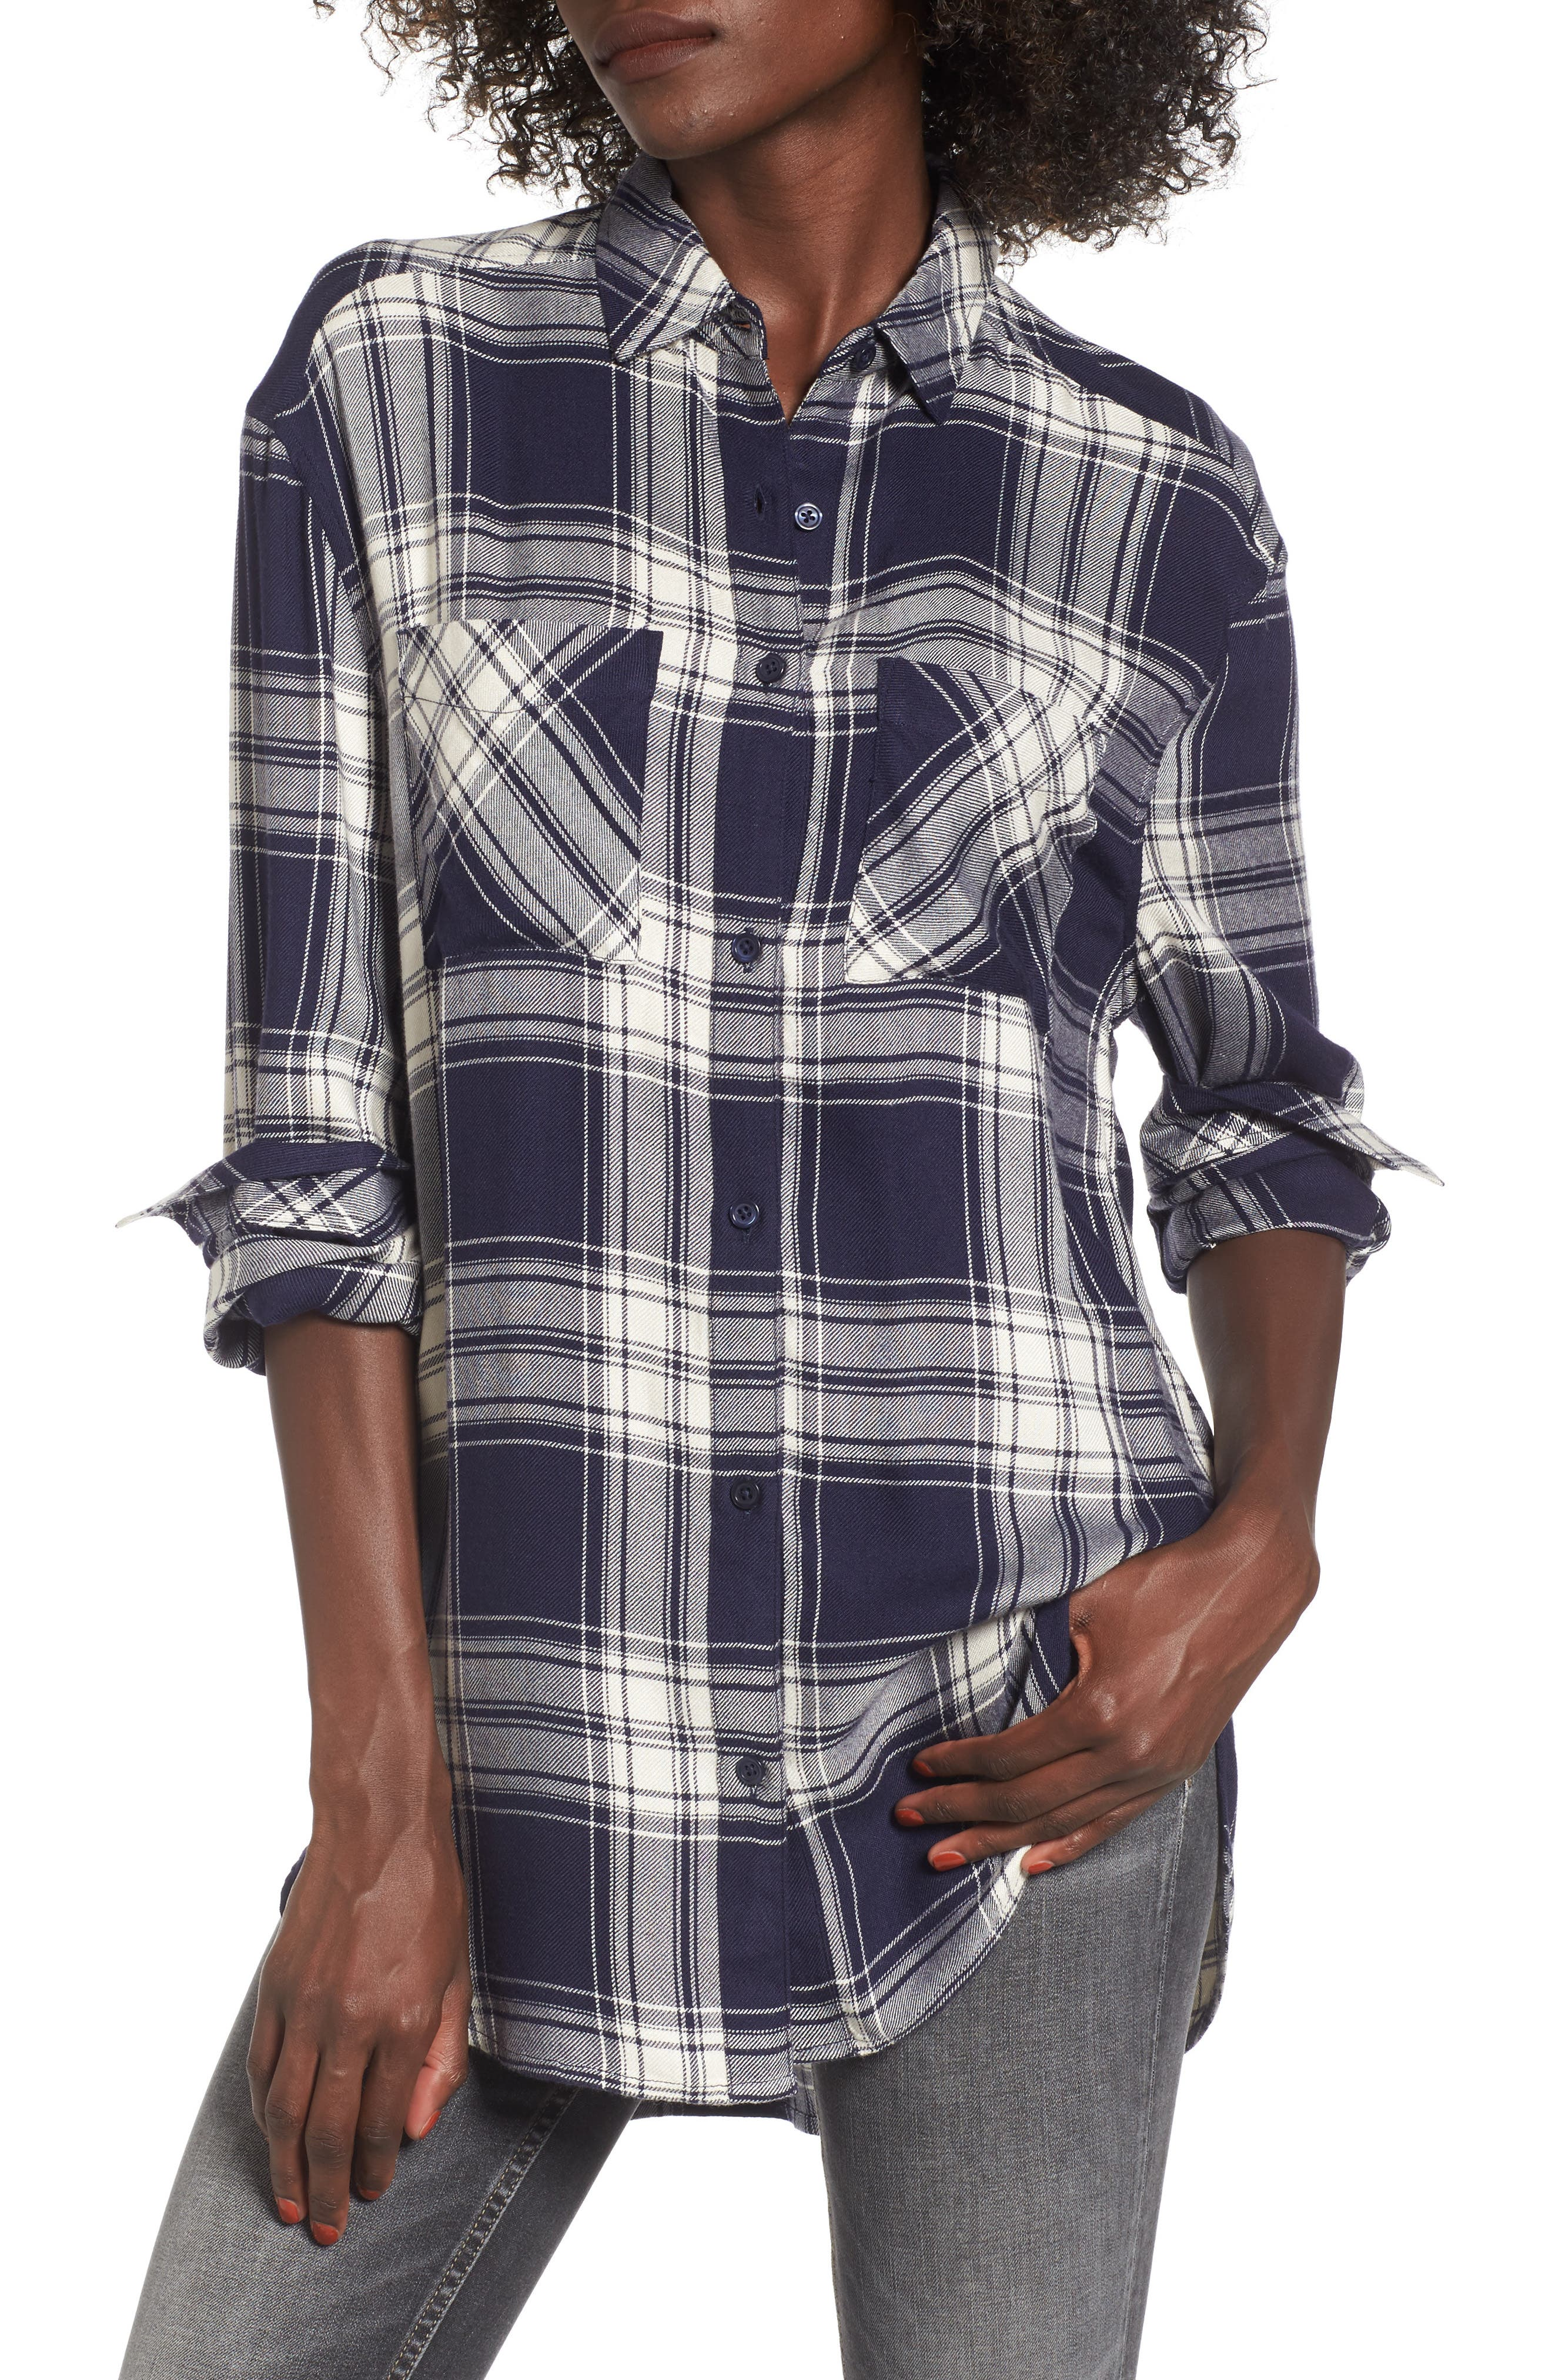 Alternate Image 1 Selected - BP. Oversize Flannel Shirt